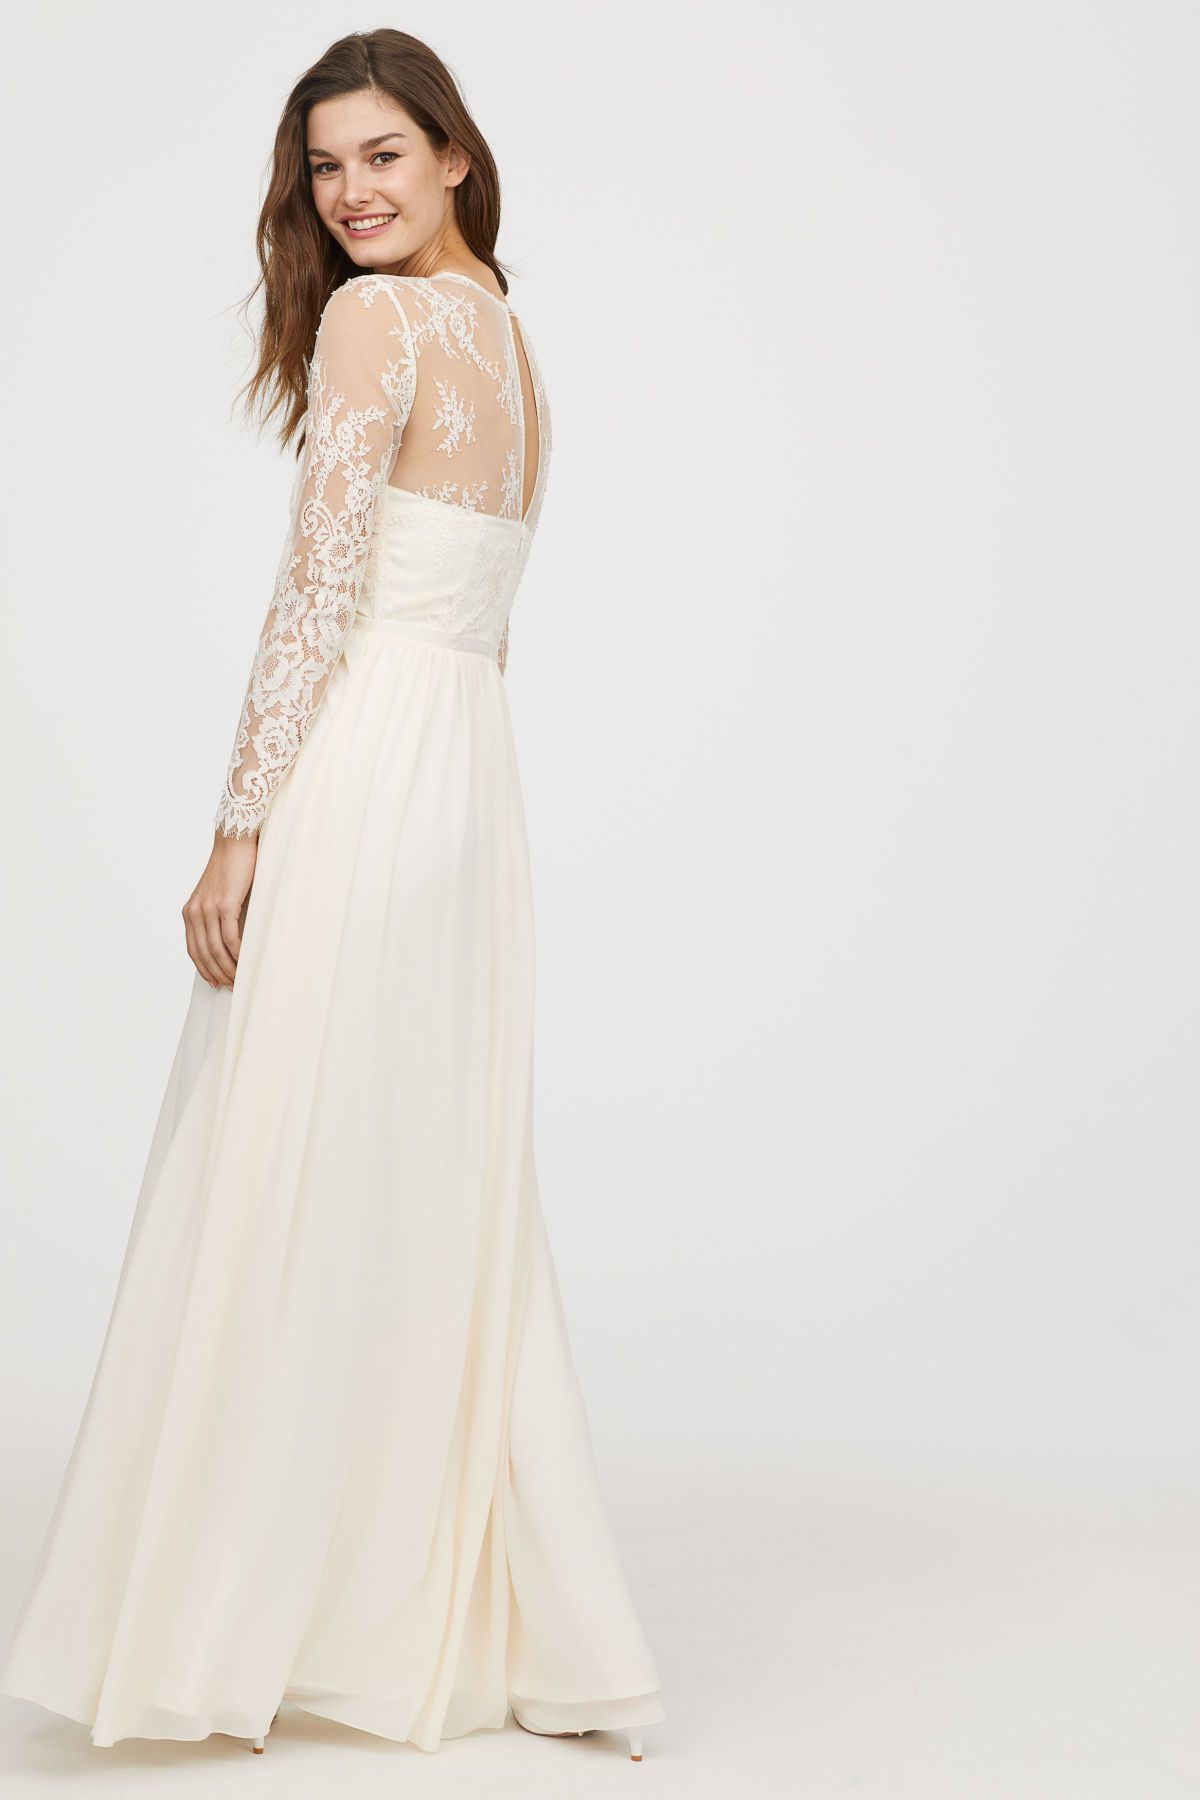 سر عكس مشاركة H M Bridesmaid Dresses Uk Consultoriaorigenydestino Com